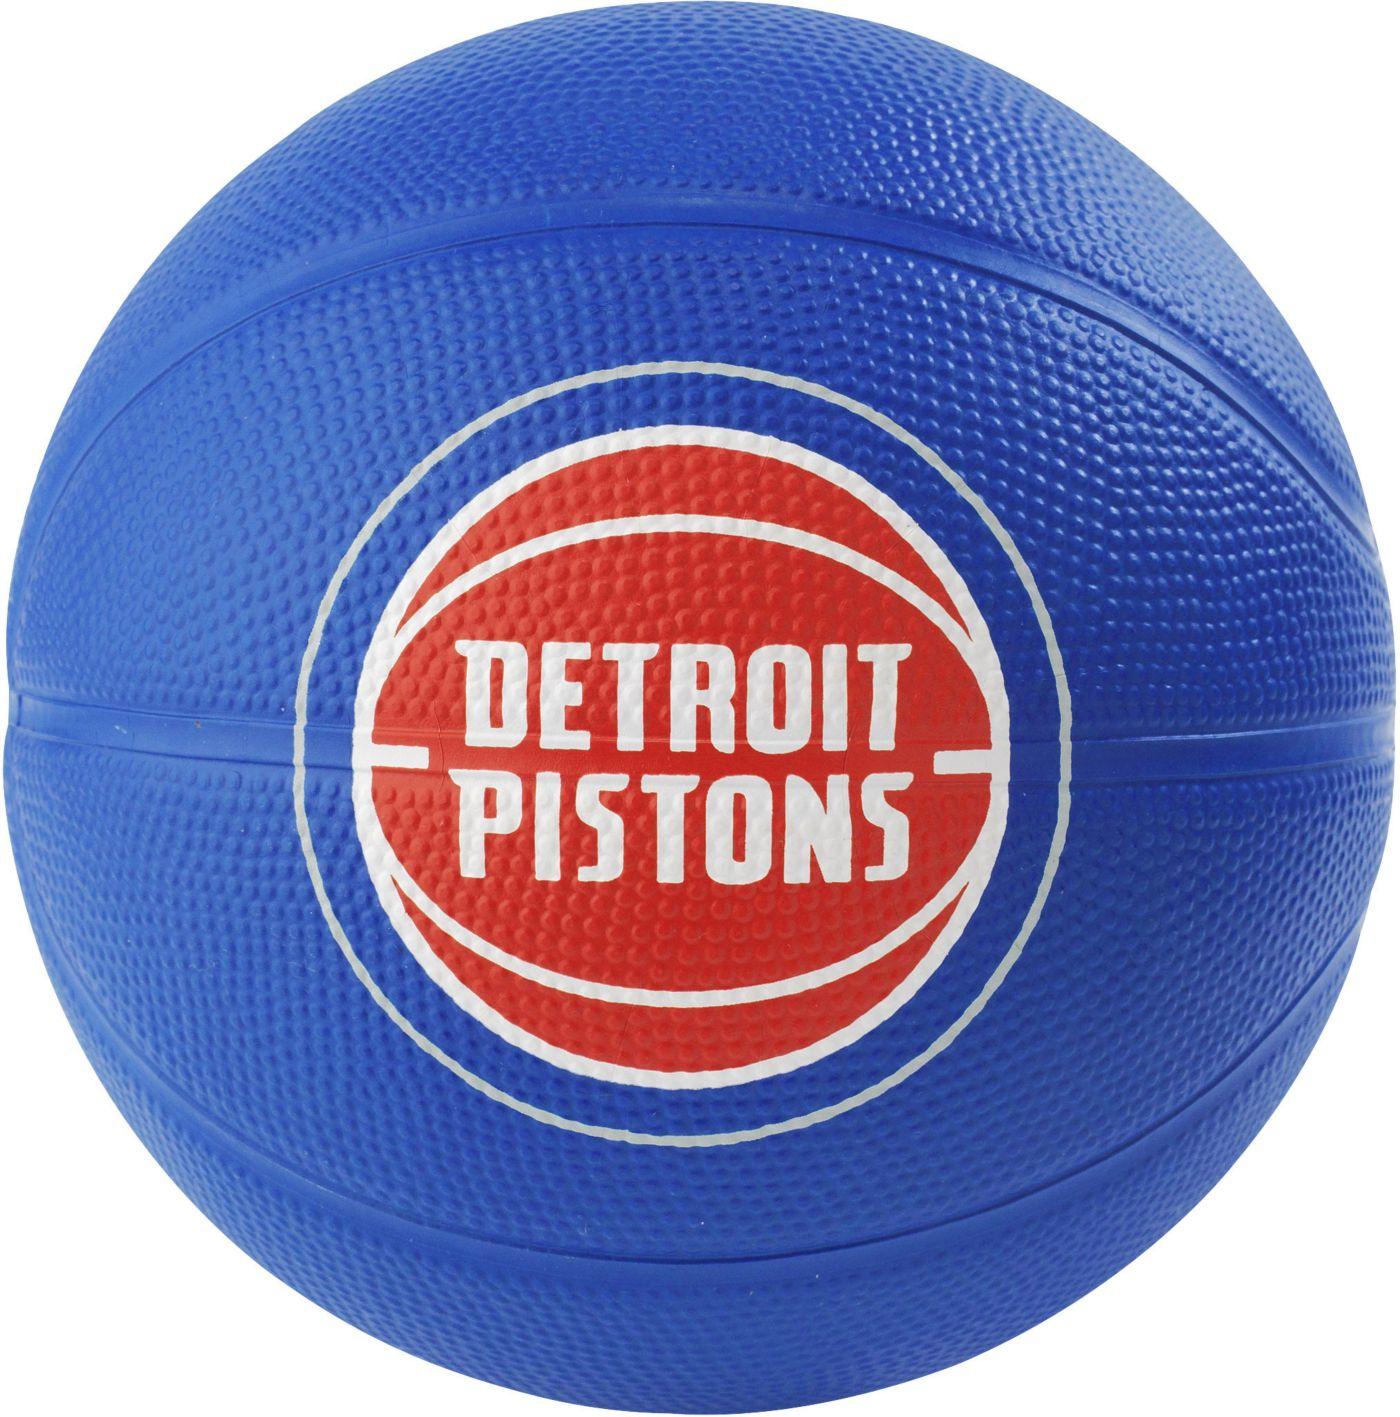 Spalding Detroit Pistons Mini Basketball